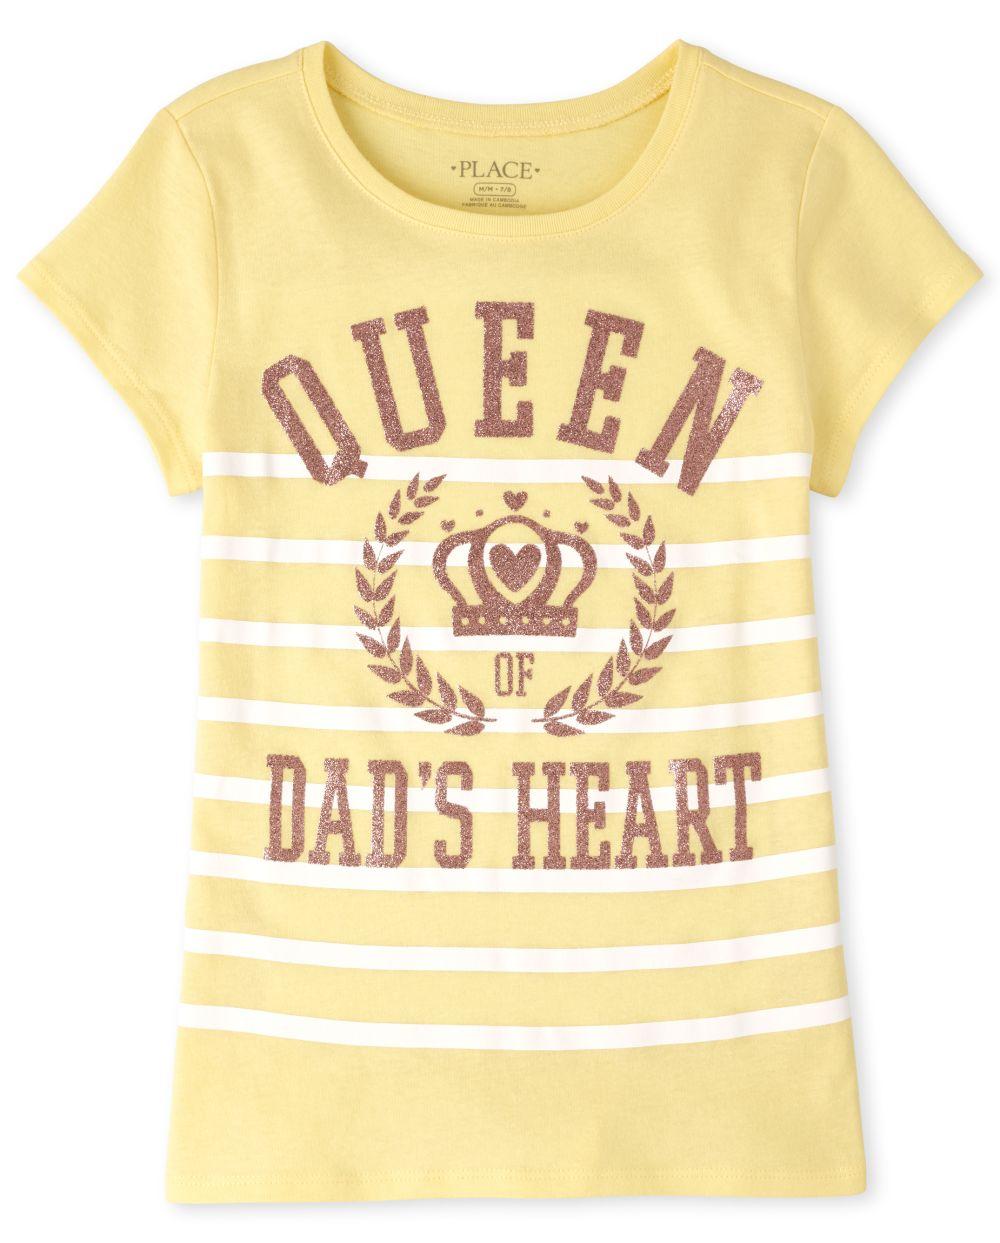 Girls Glitter Dad's Heart Graphic Tee